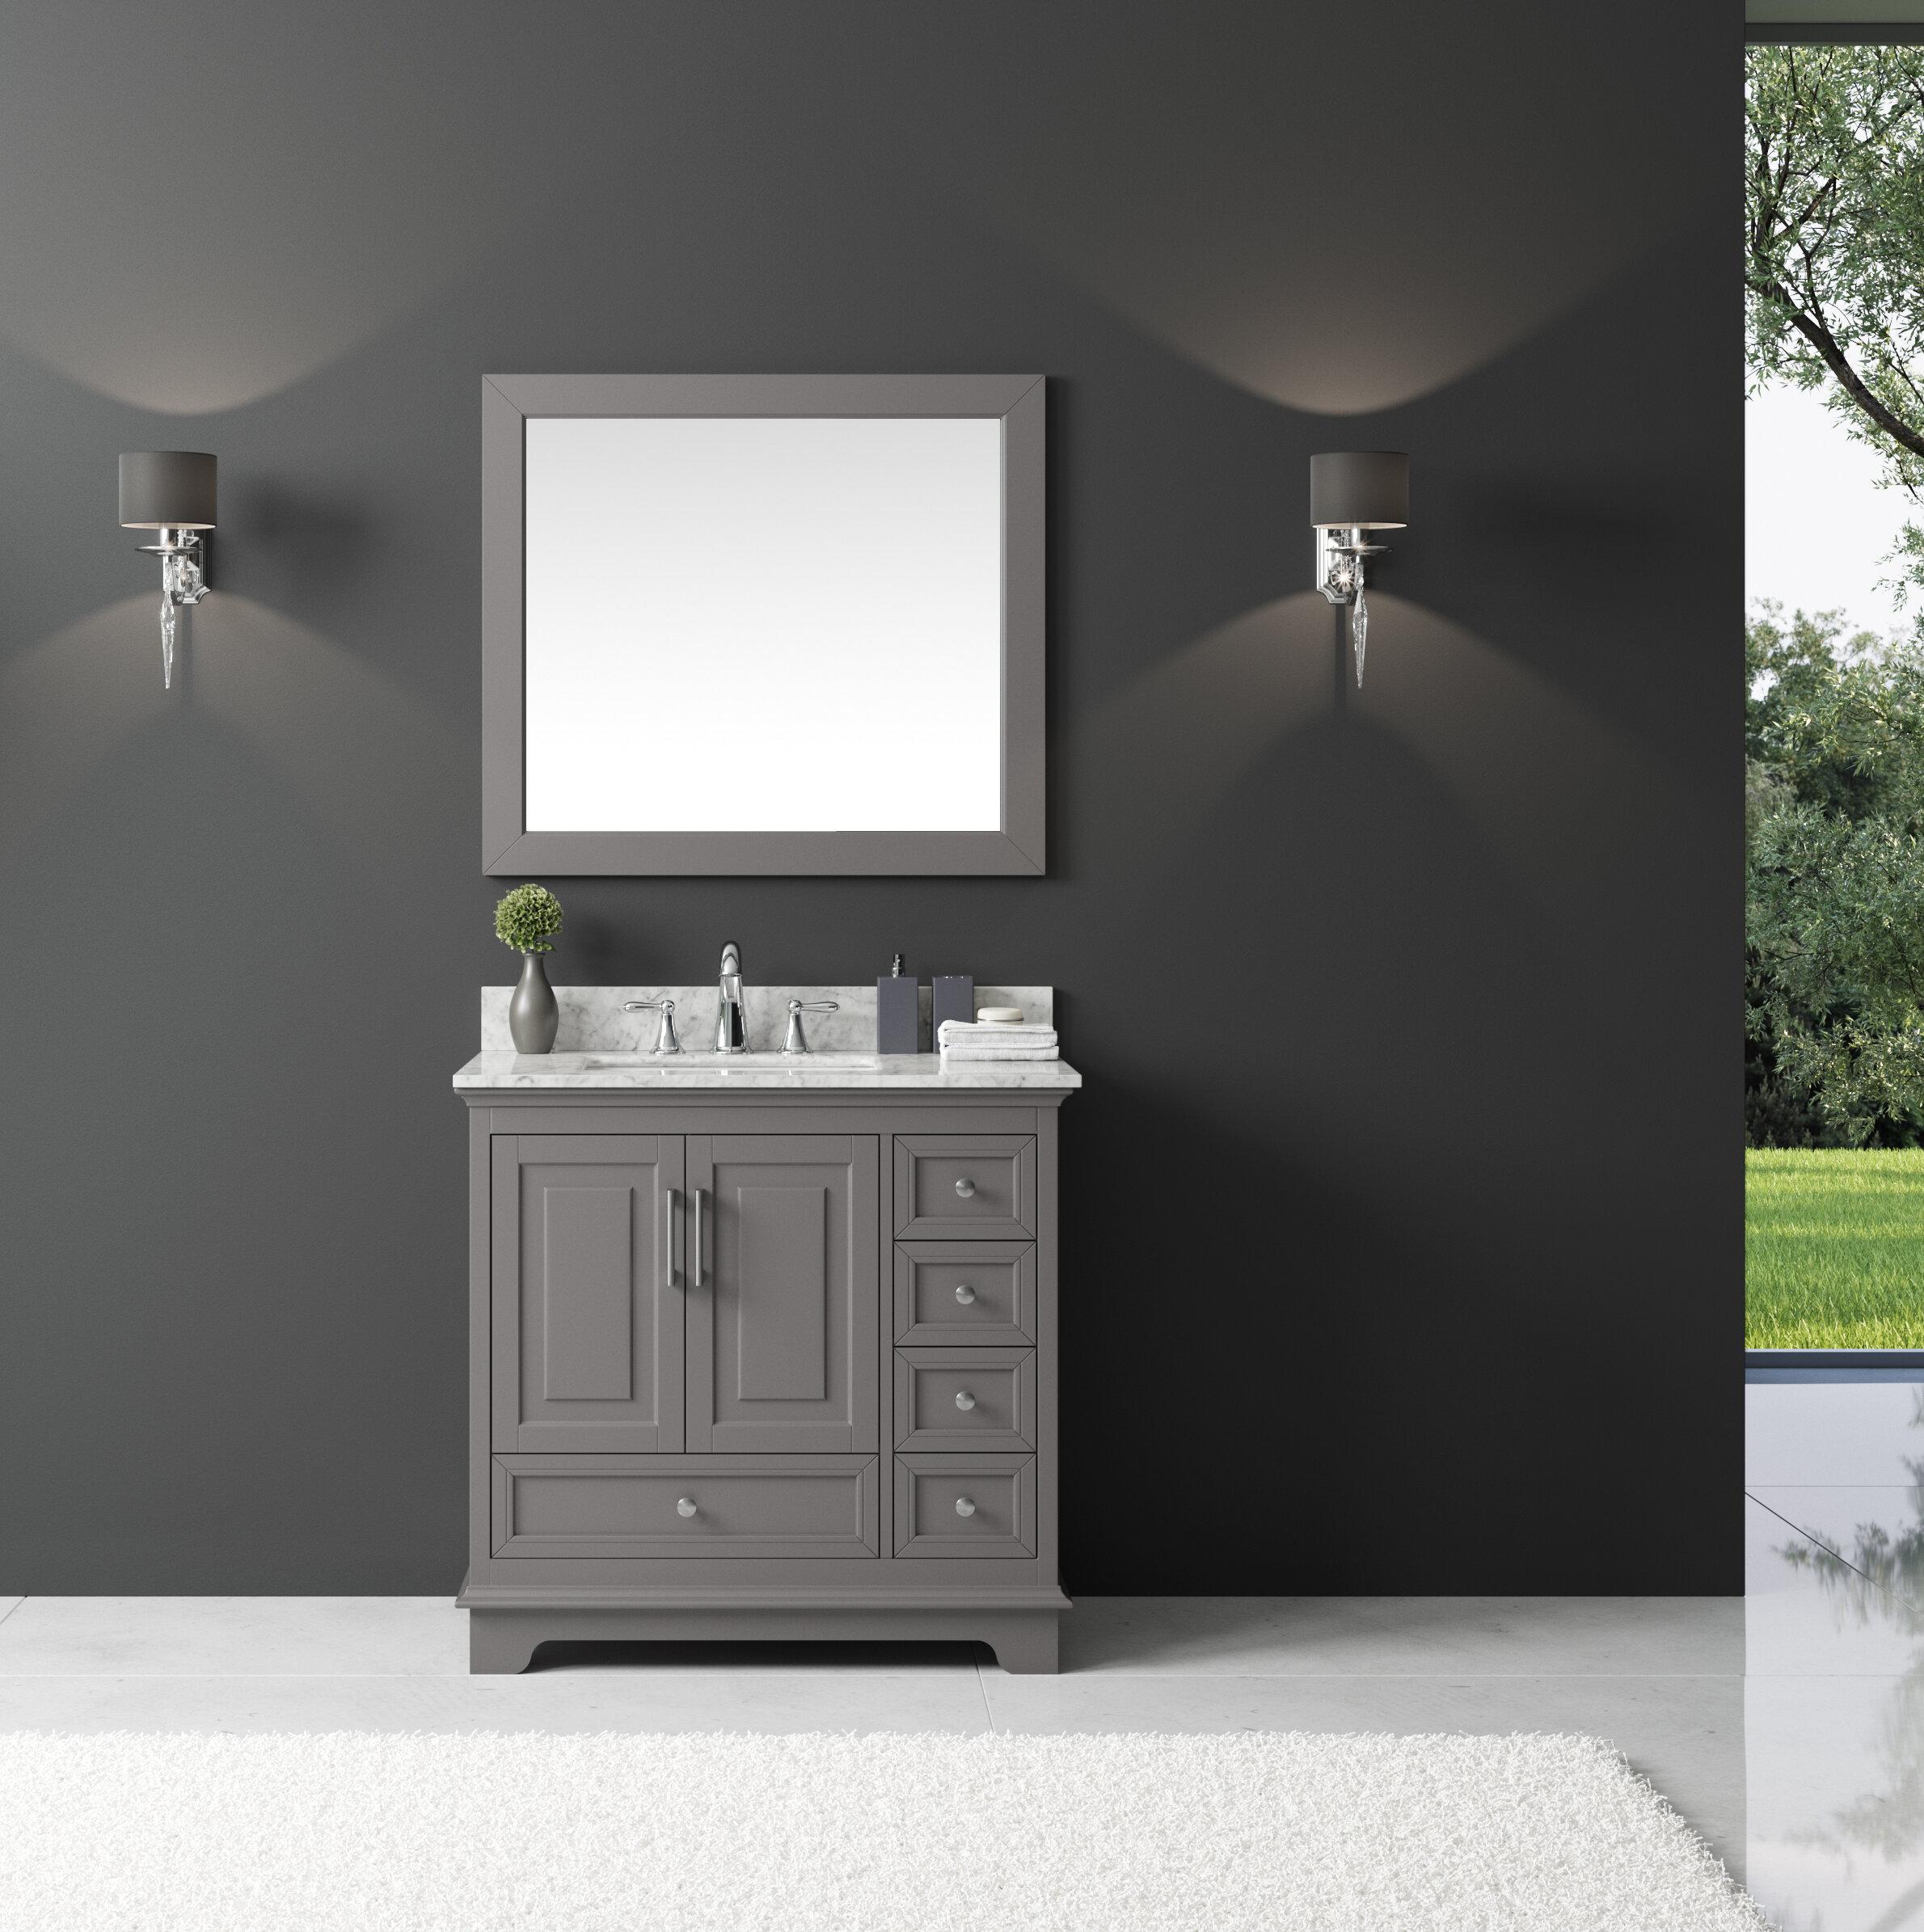 Outstanding Orin 36 Single Bathroom Vanity Set With Mirror Download Free Architecture Designs Scobabritishbridgeorg